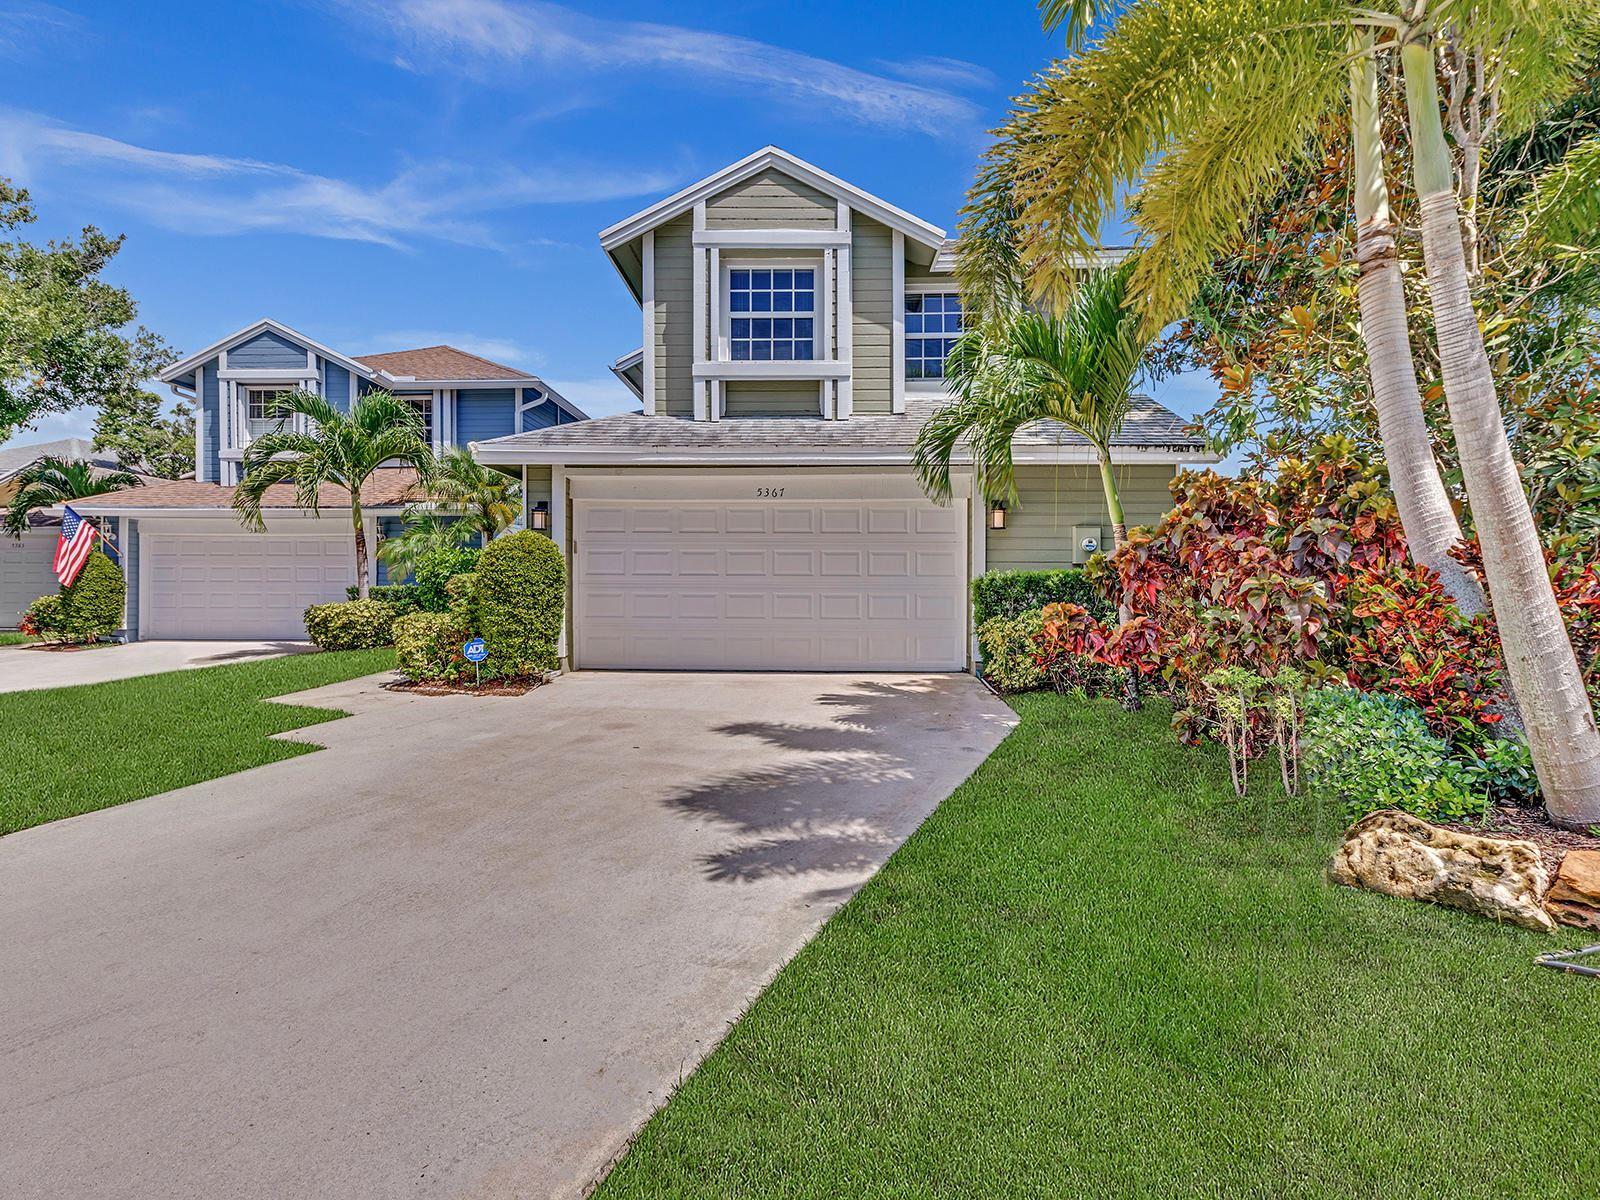 5367 214th Court S, Boca Raton, FL 33486 - #: RX-10732978